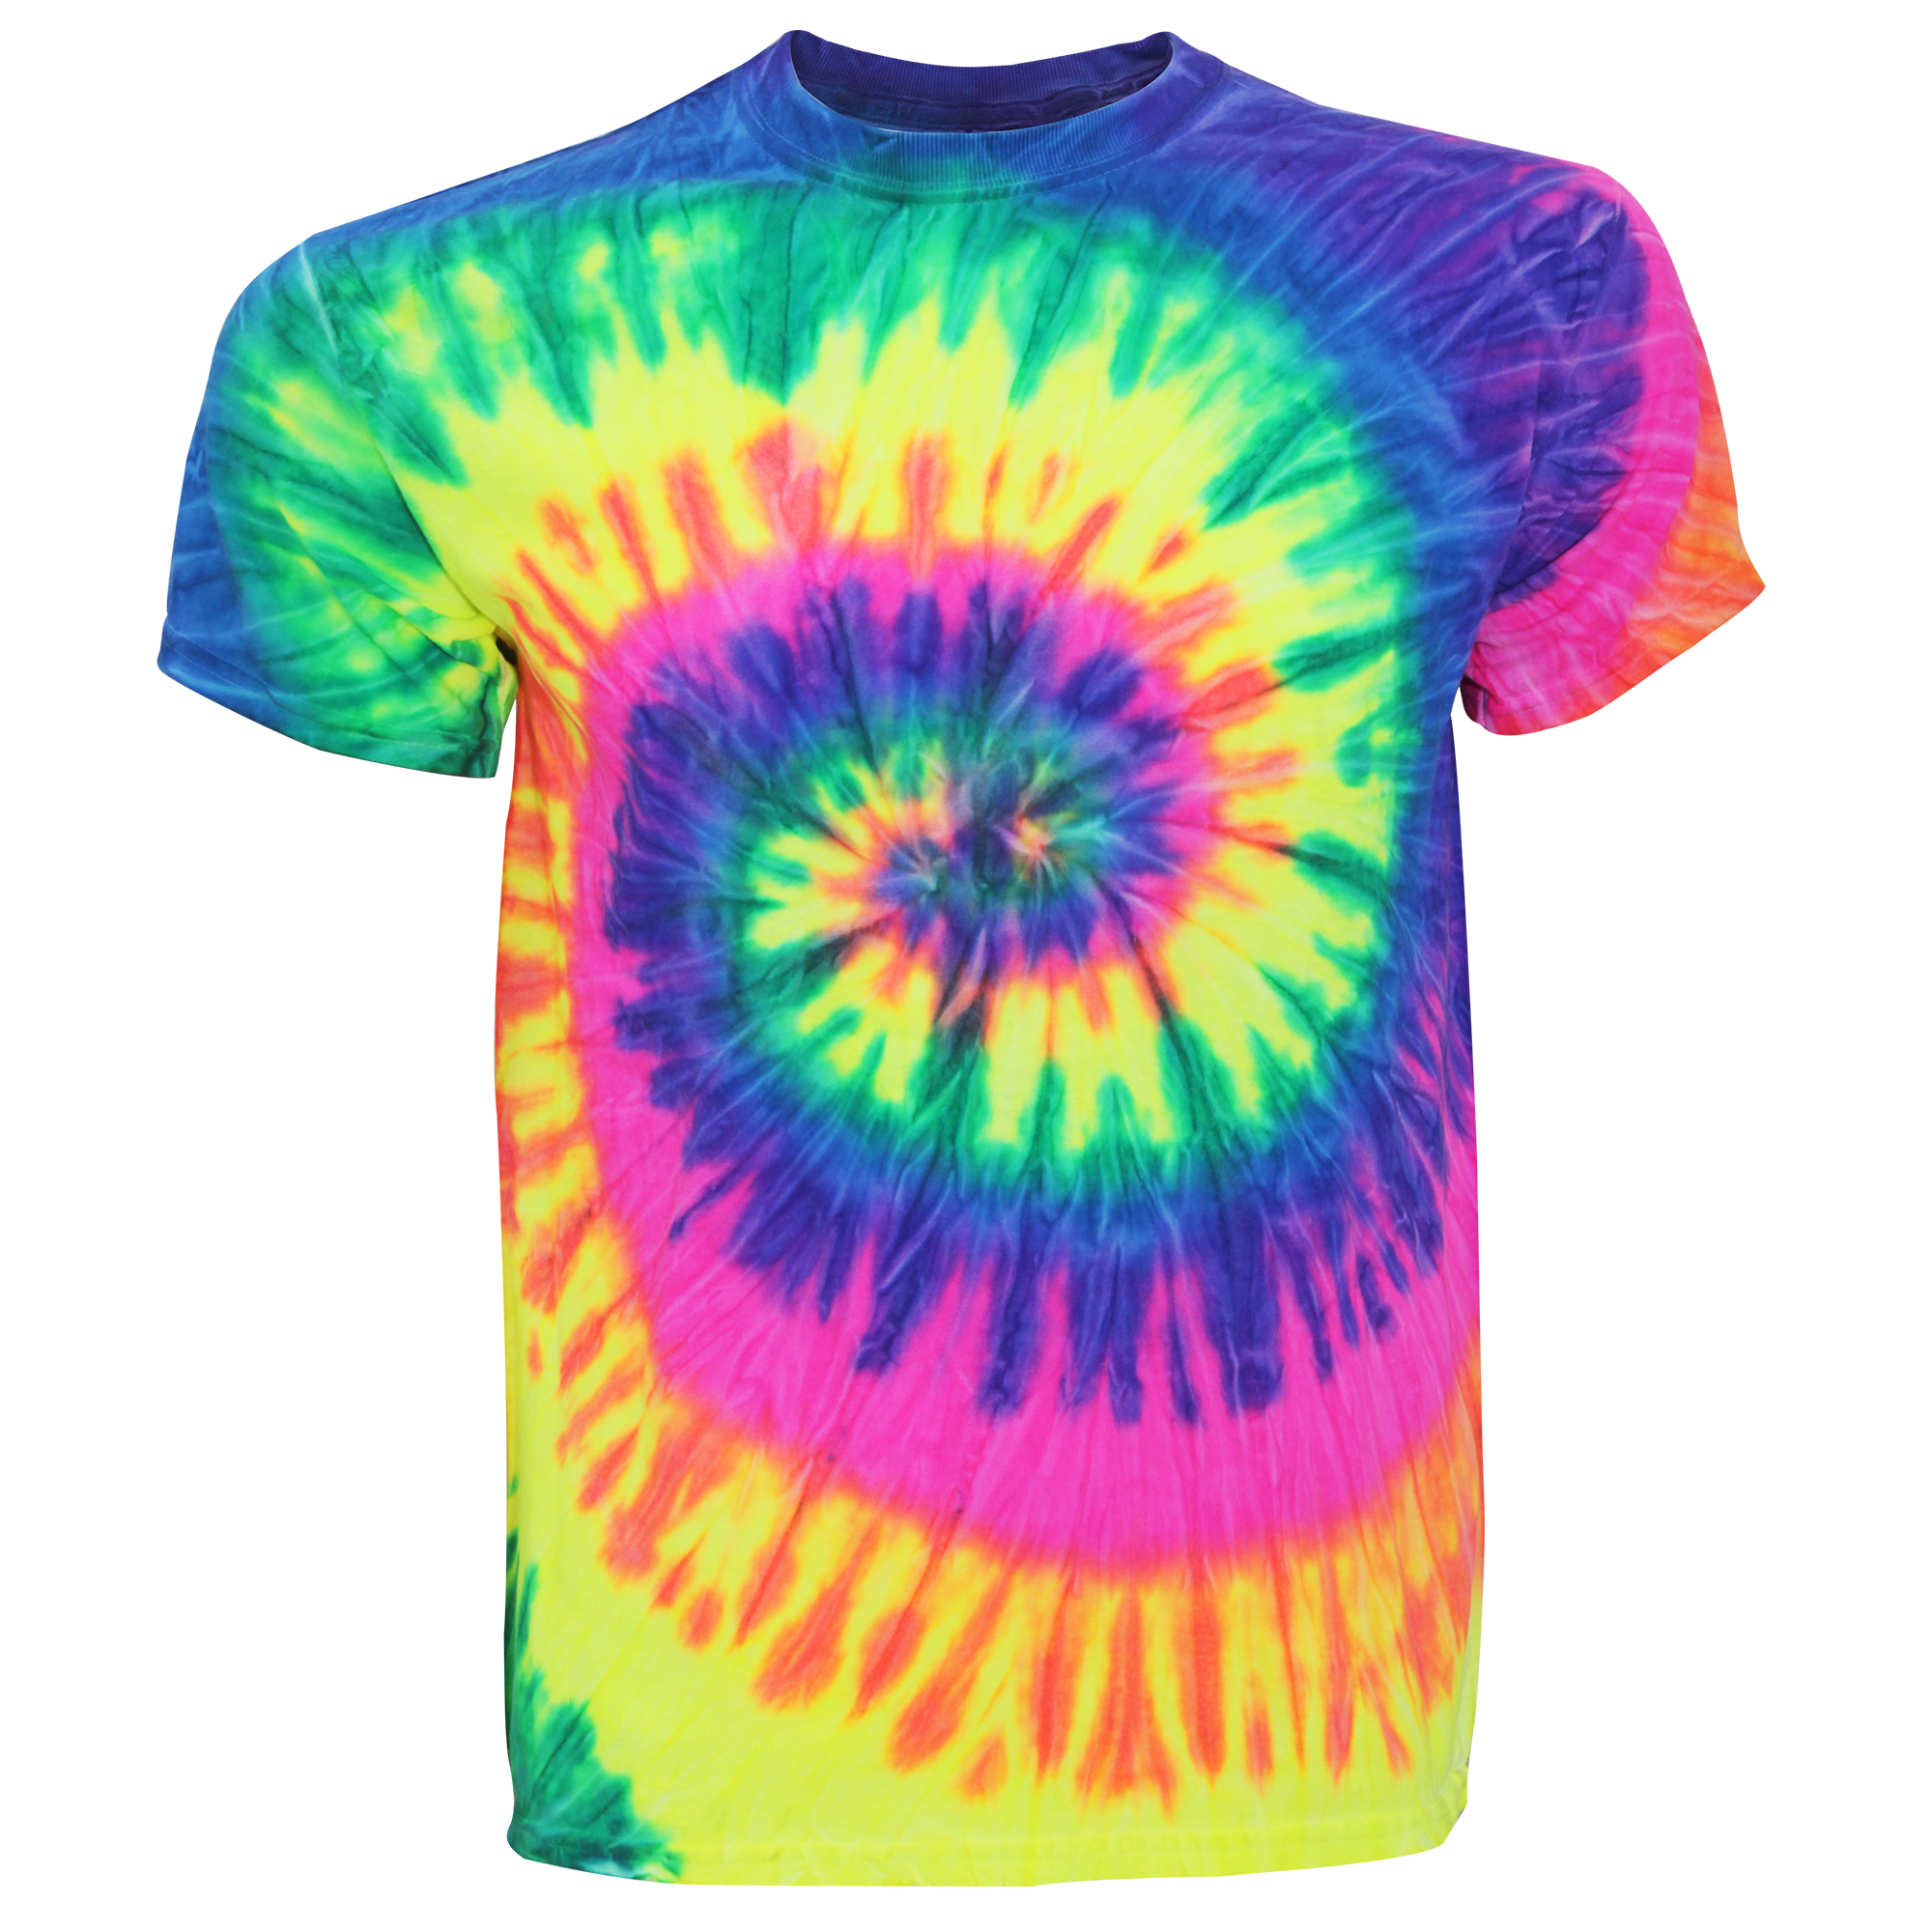 Tduk mens short sleeve rainbow tie dye t shirt ebay for Tie dye mens t shirts